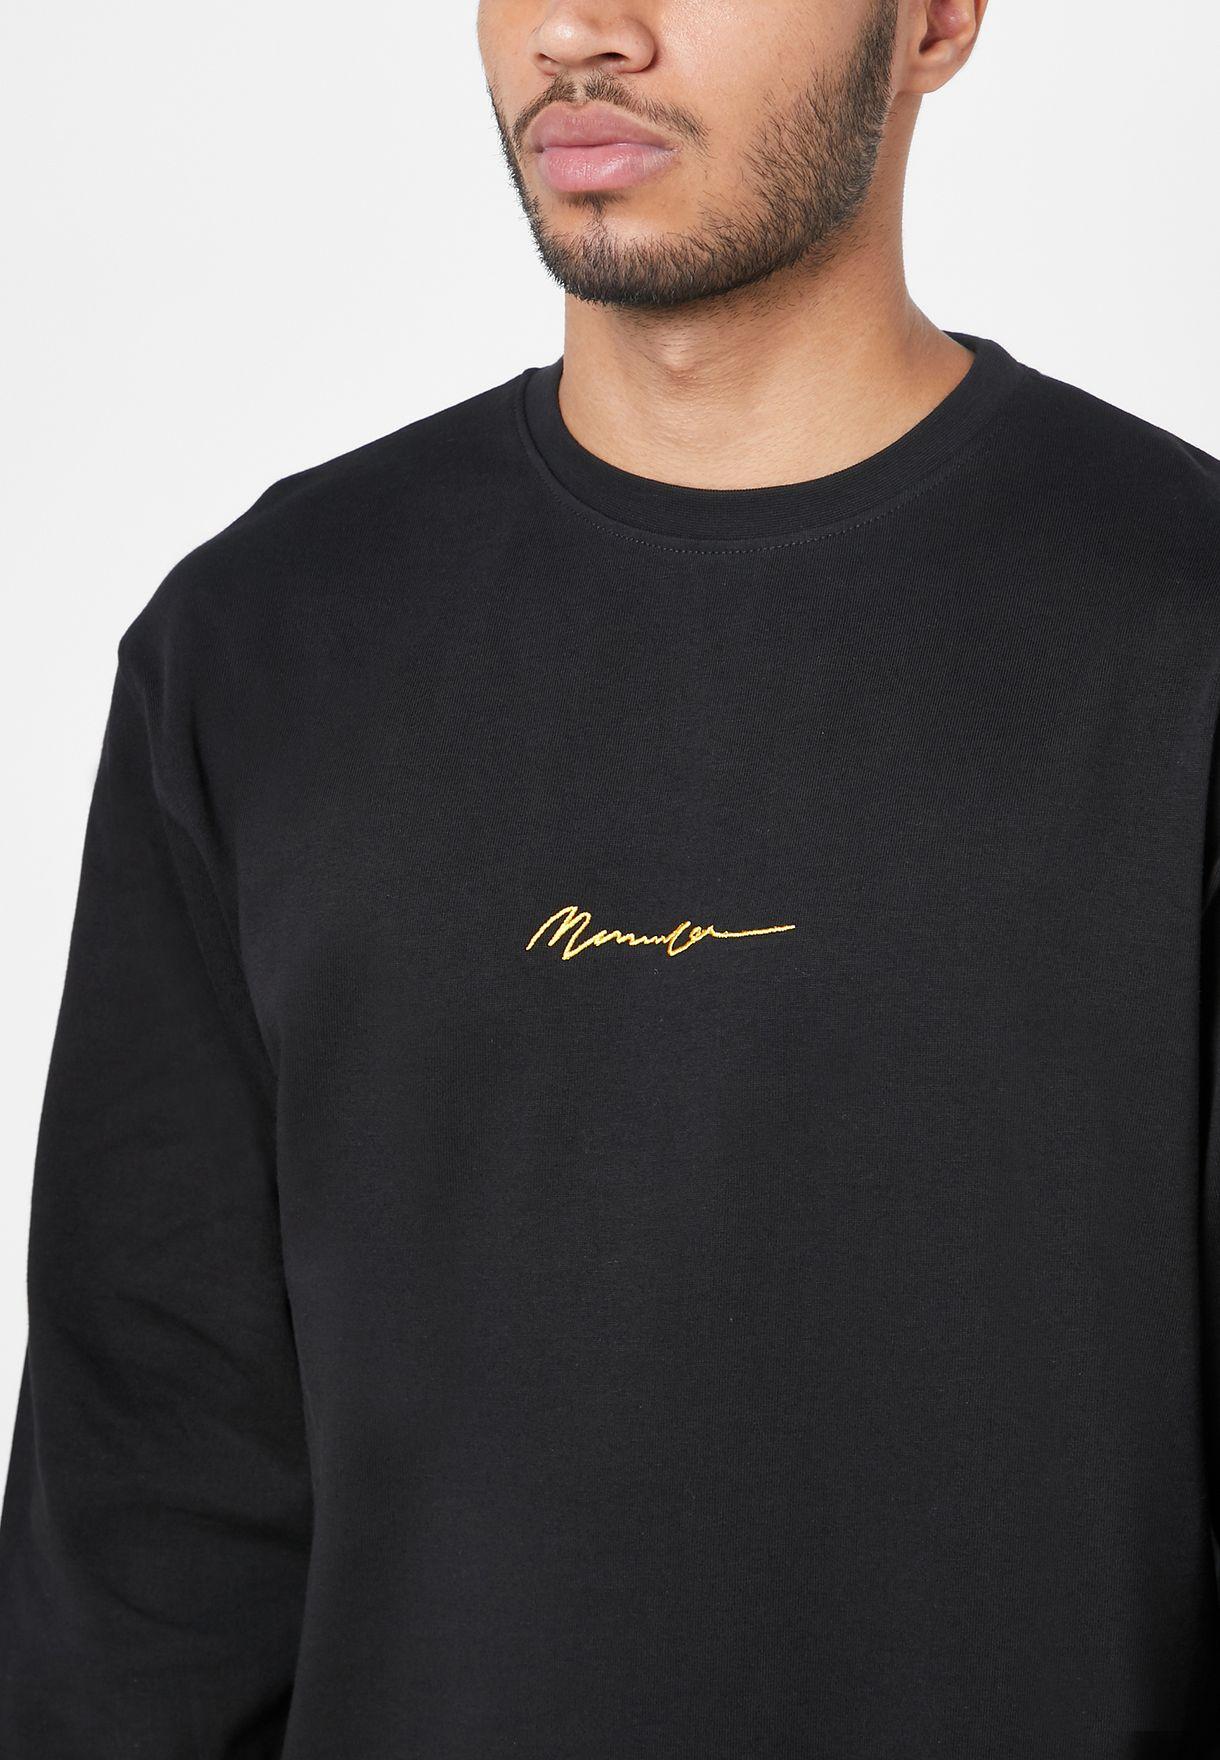 Logo Signature Crew Neck Sweatshirt